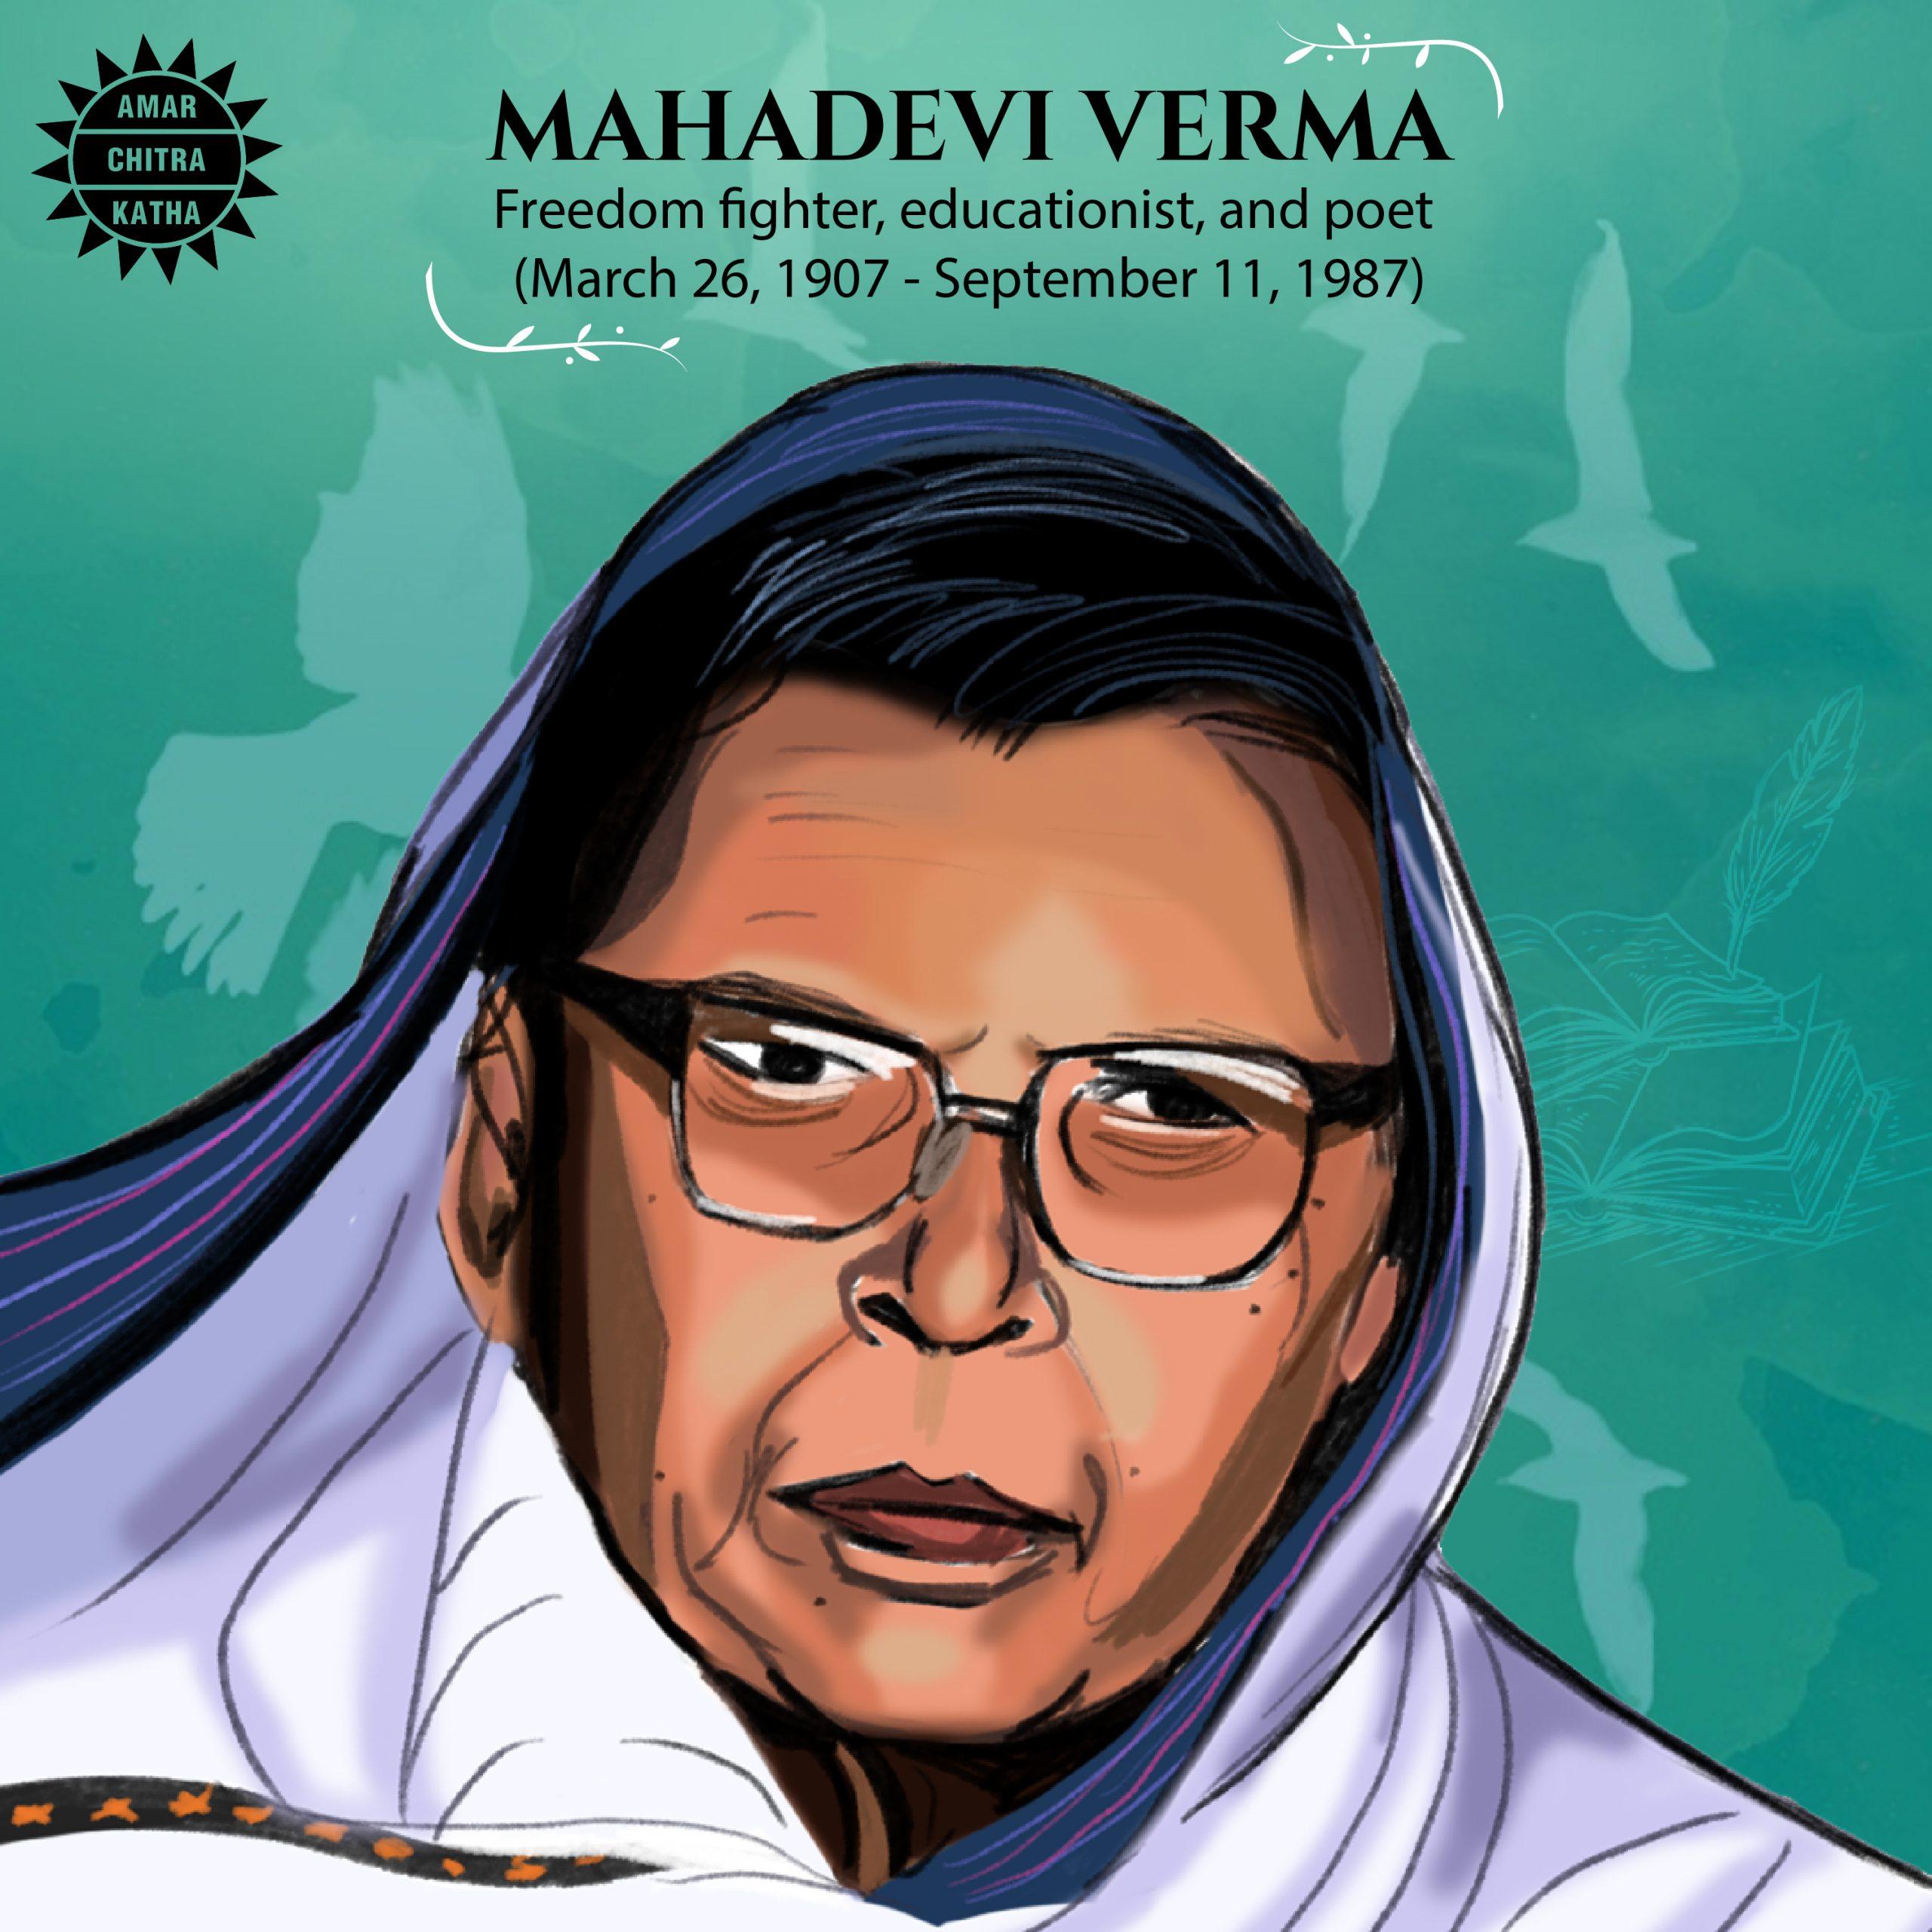 Mahadevi Varma India's Freedom Fighter Poet